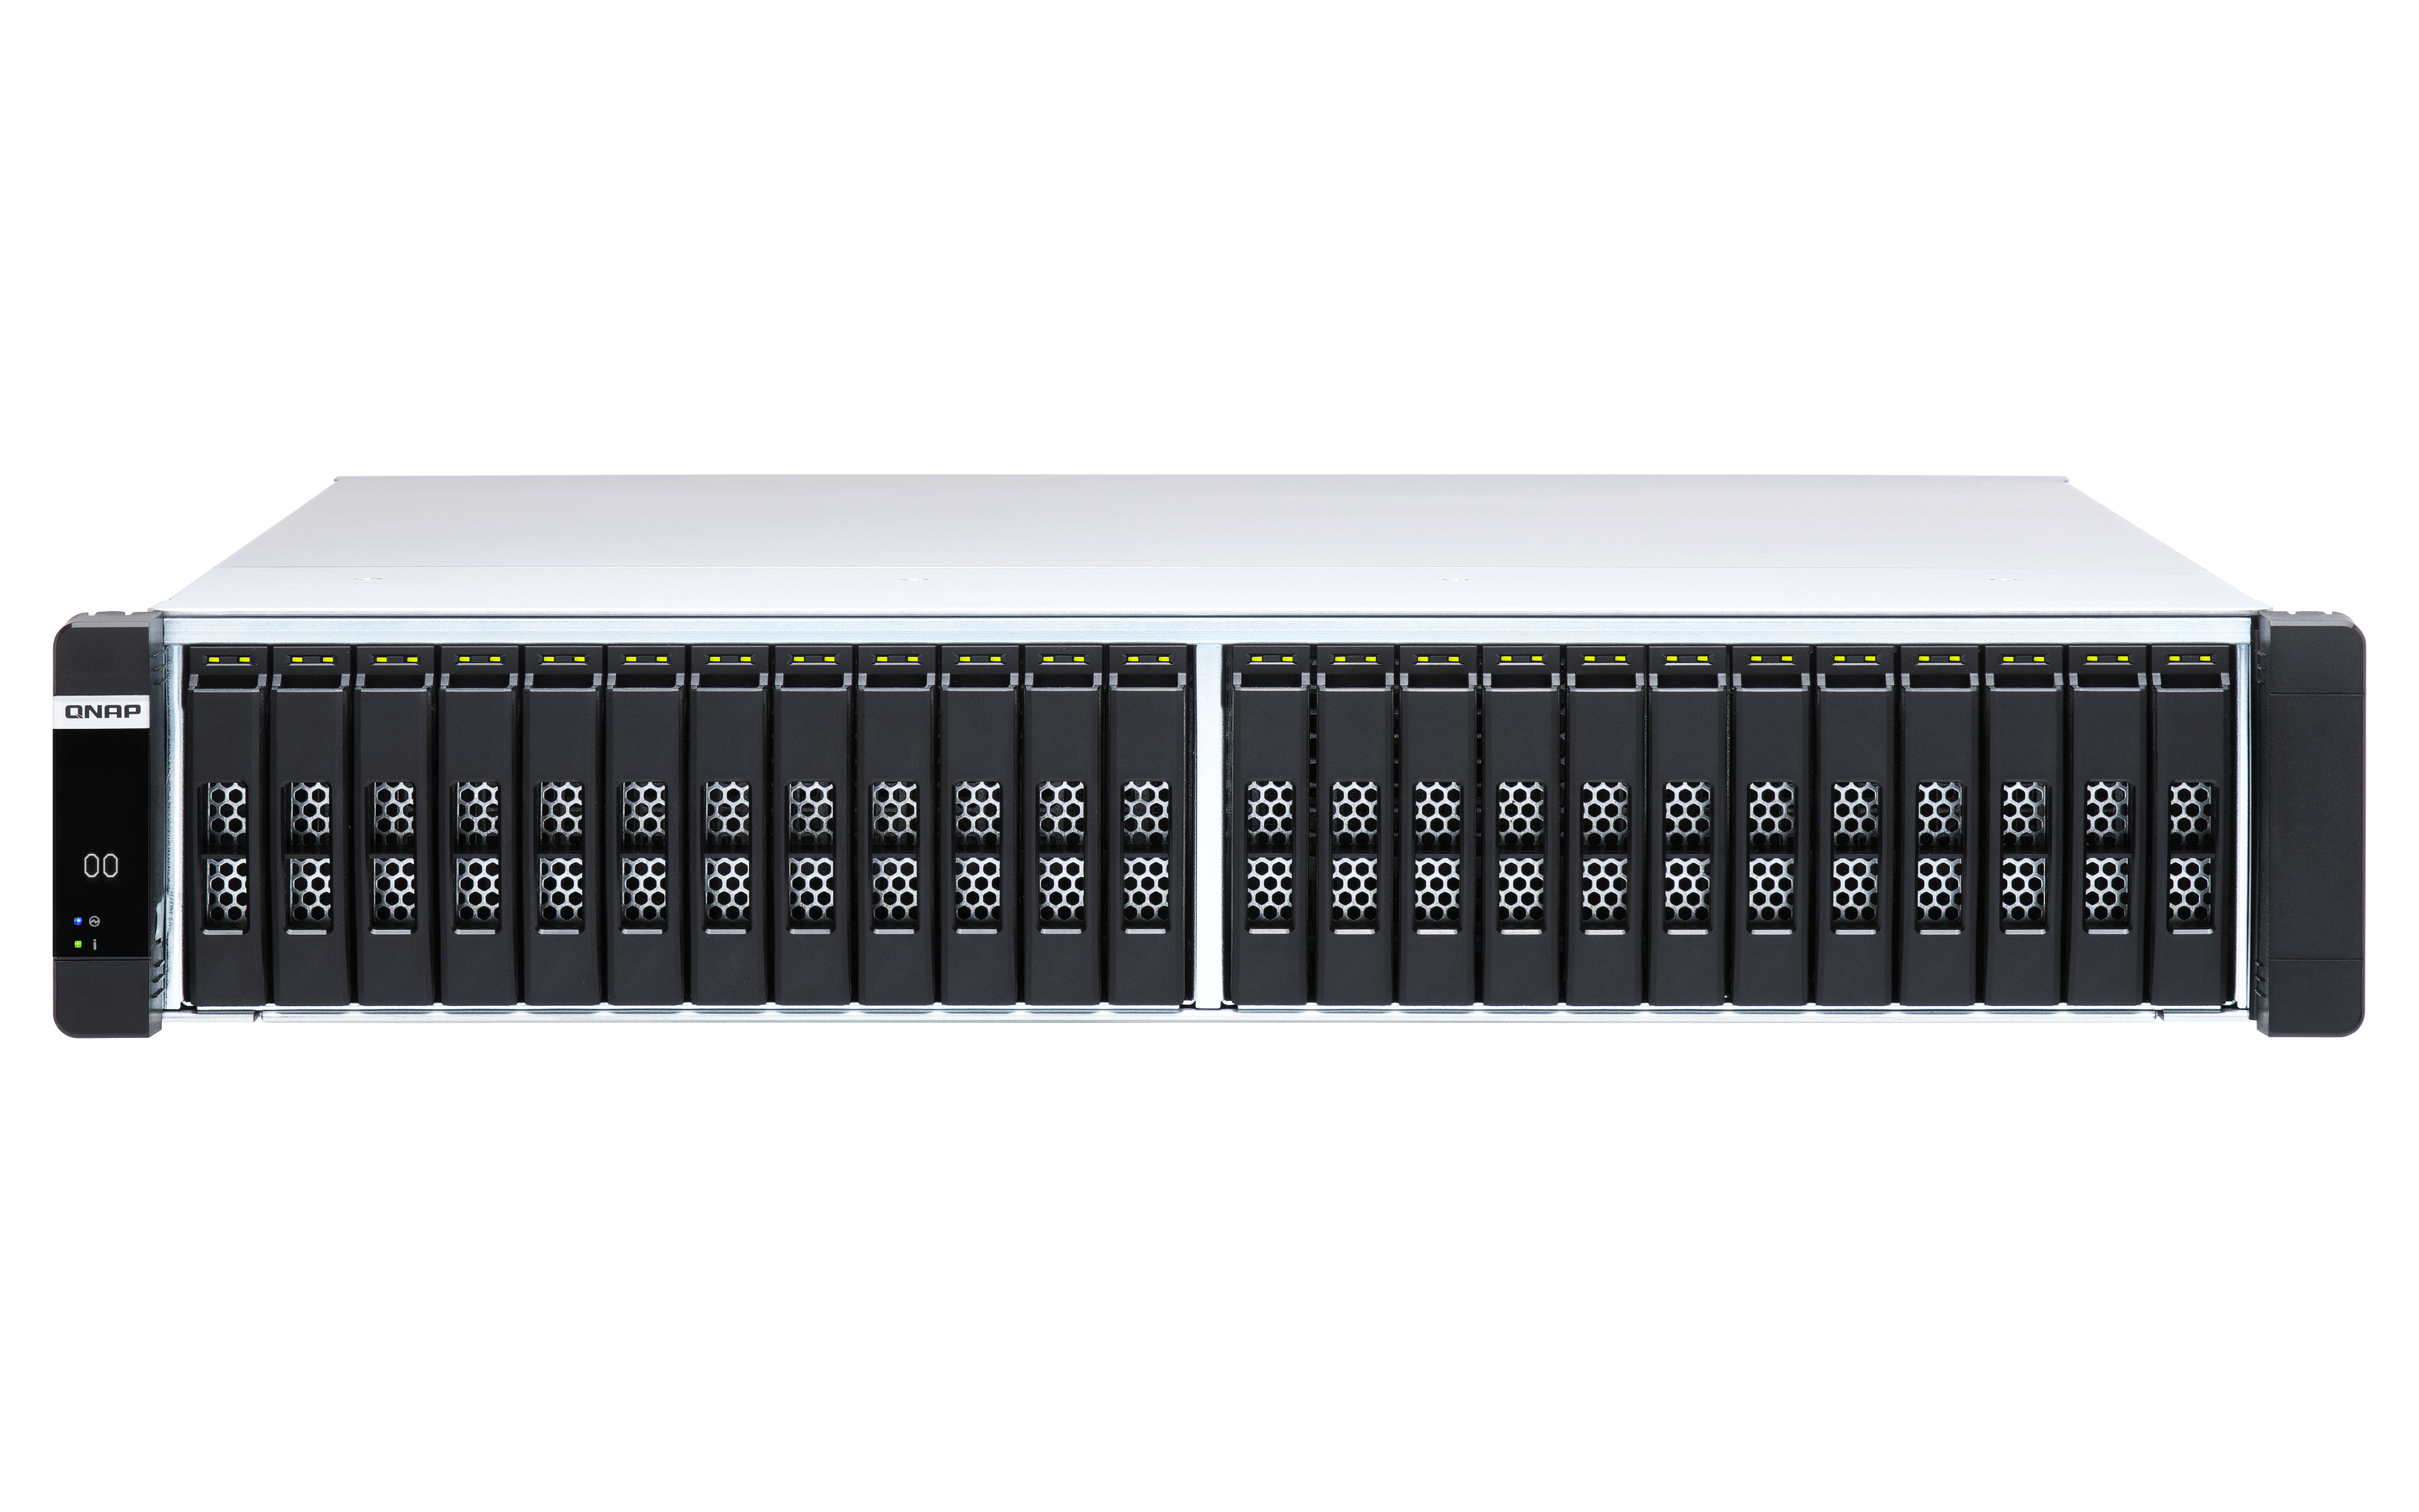 ES2486DC-2142IT-128G-US